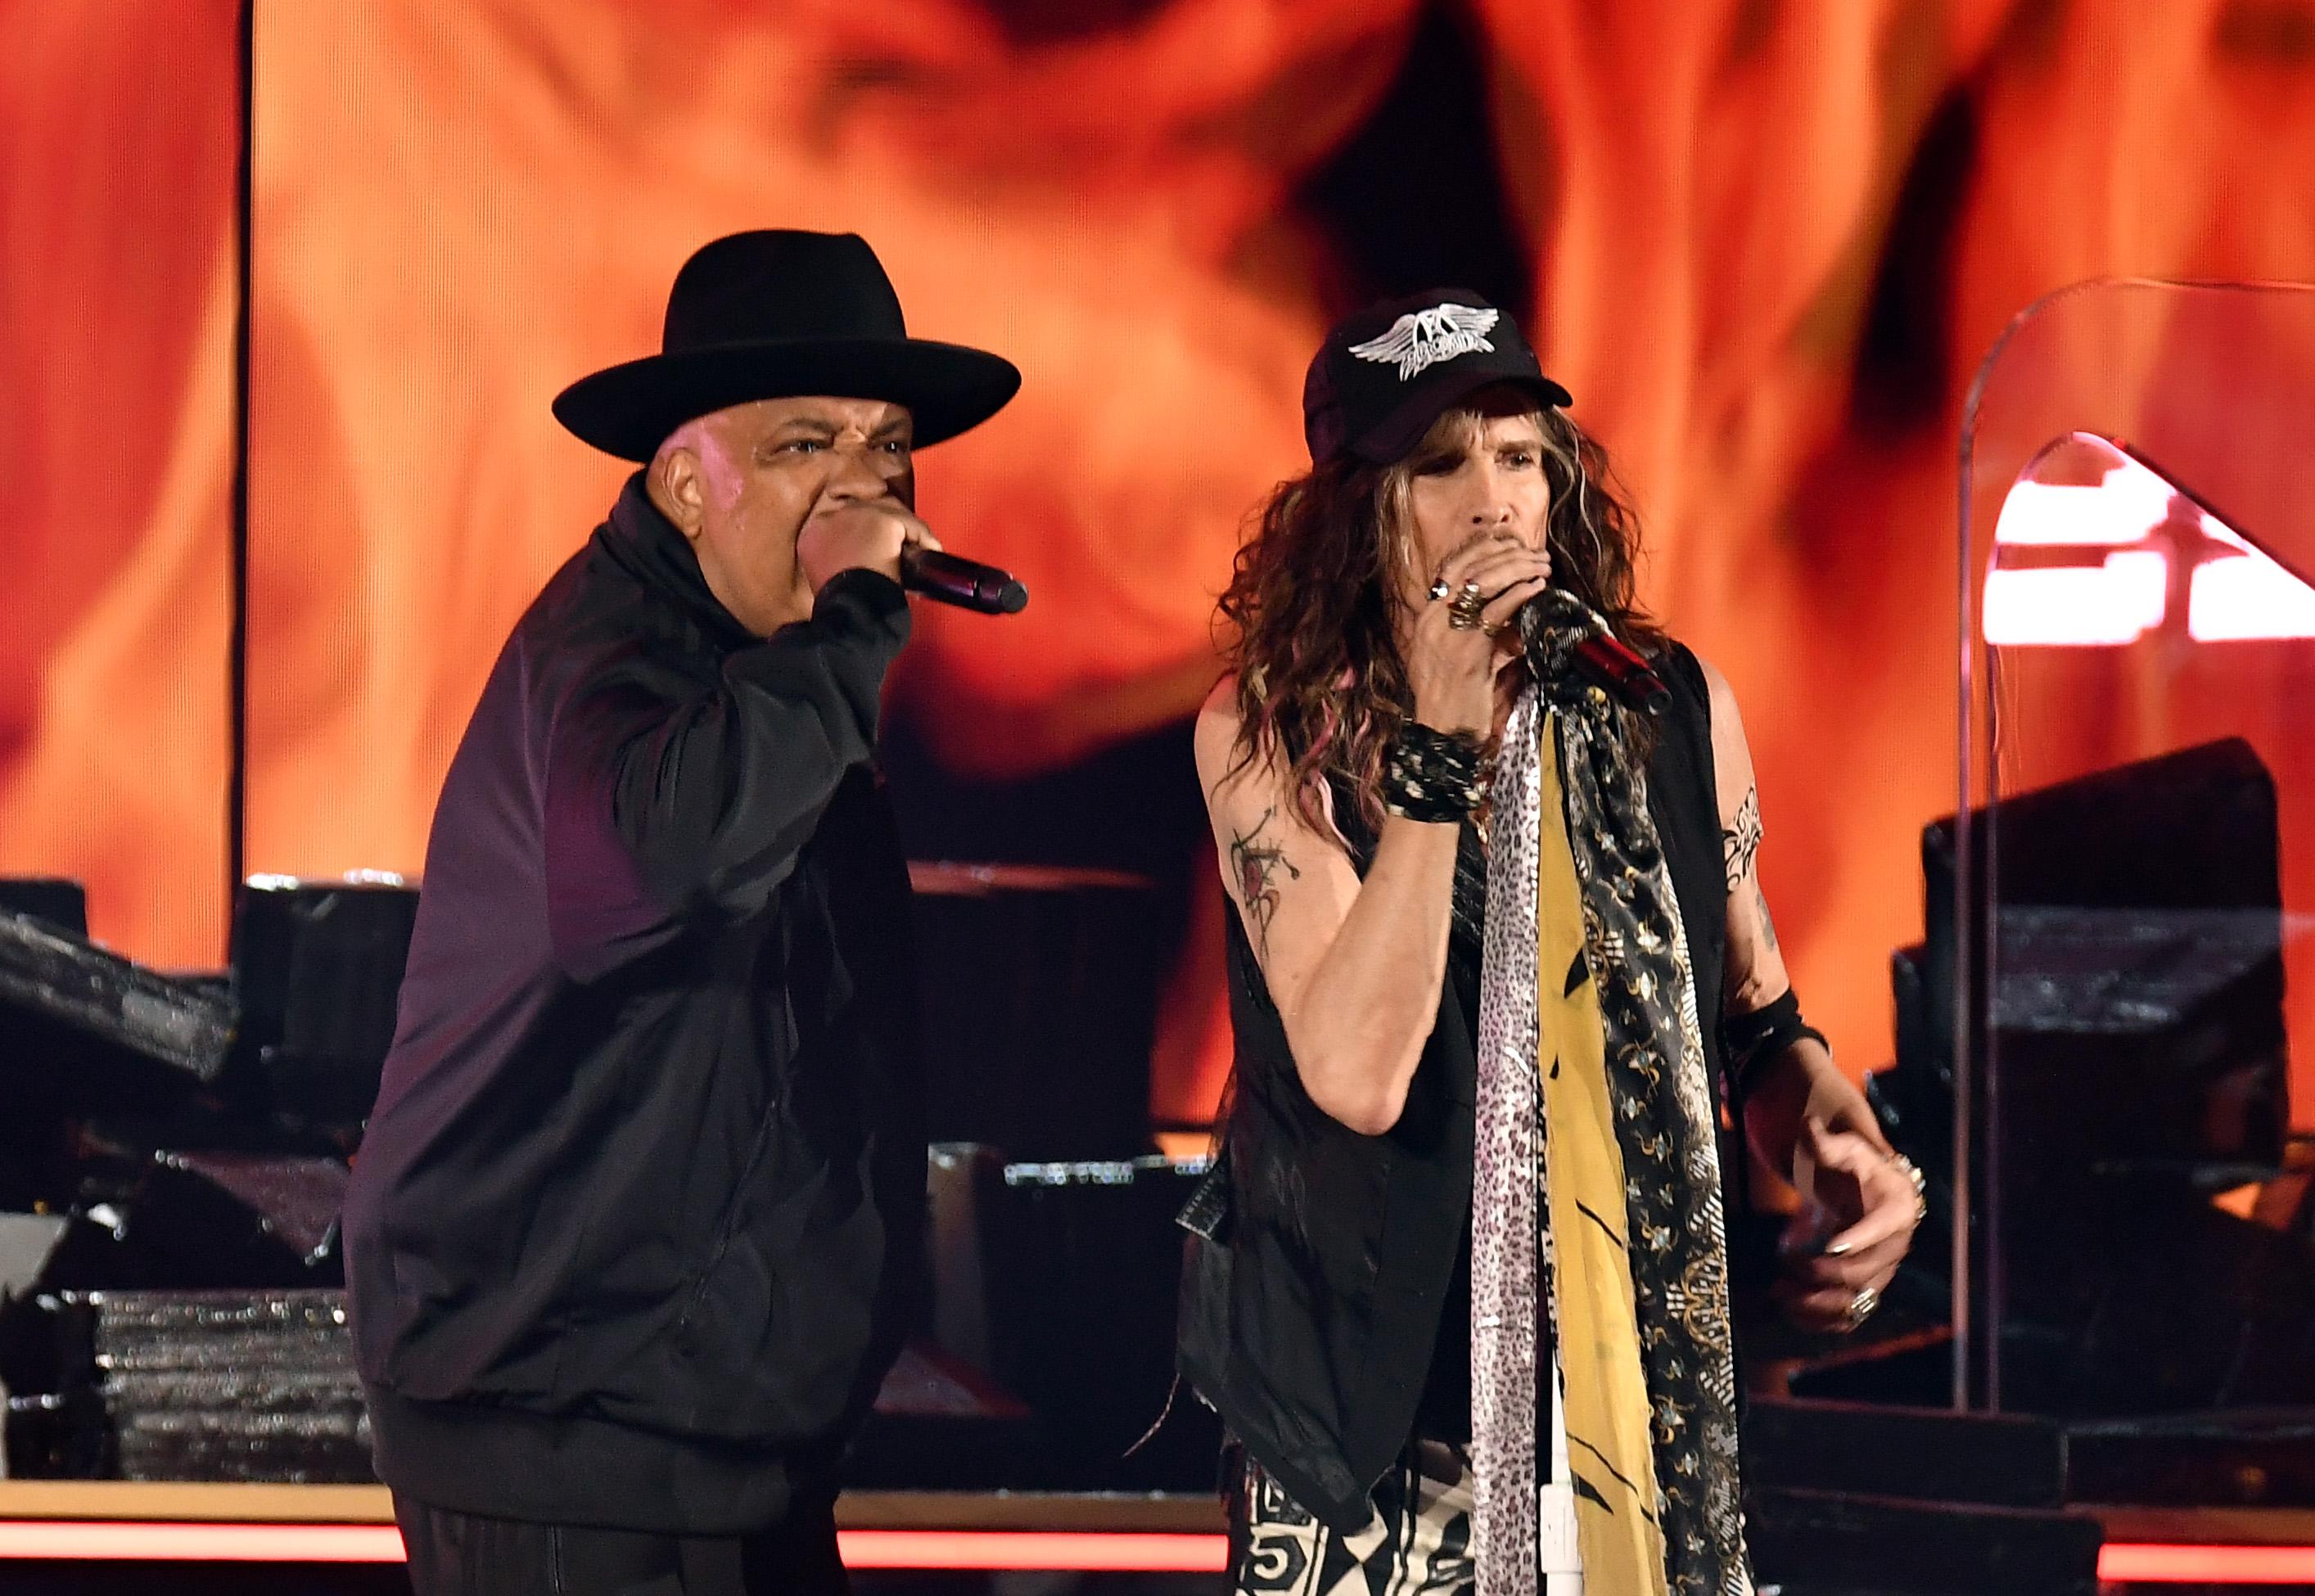 Aerosmith Performs Rockin' Rendition of 'Walk This Way' With Run-D.M.C. at 2020 Grammys — Watch!